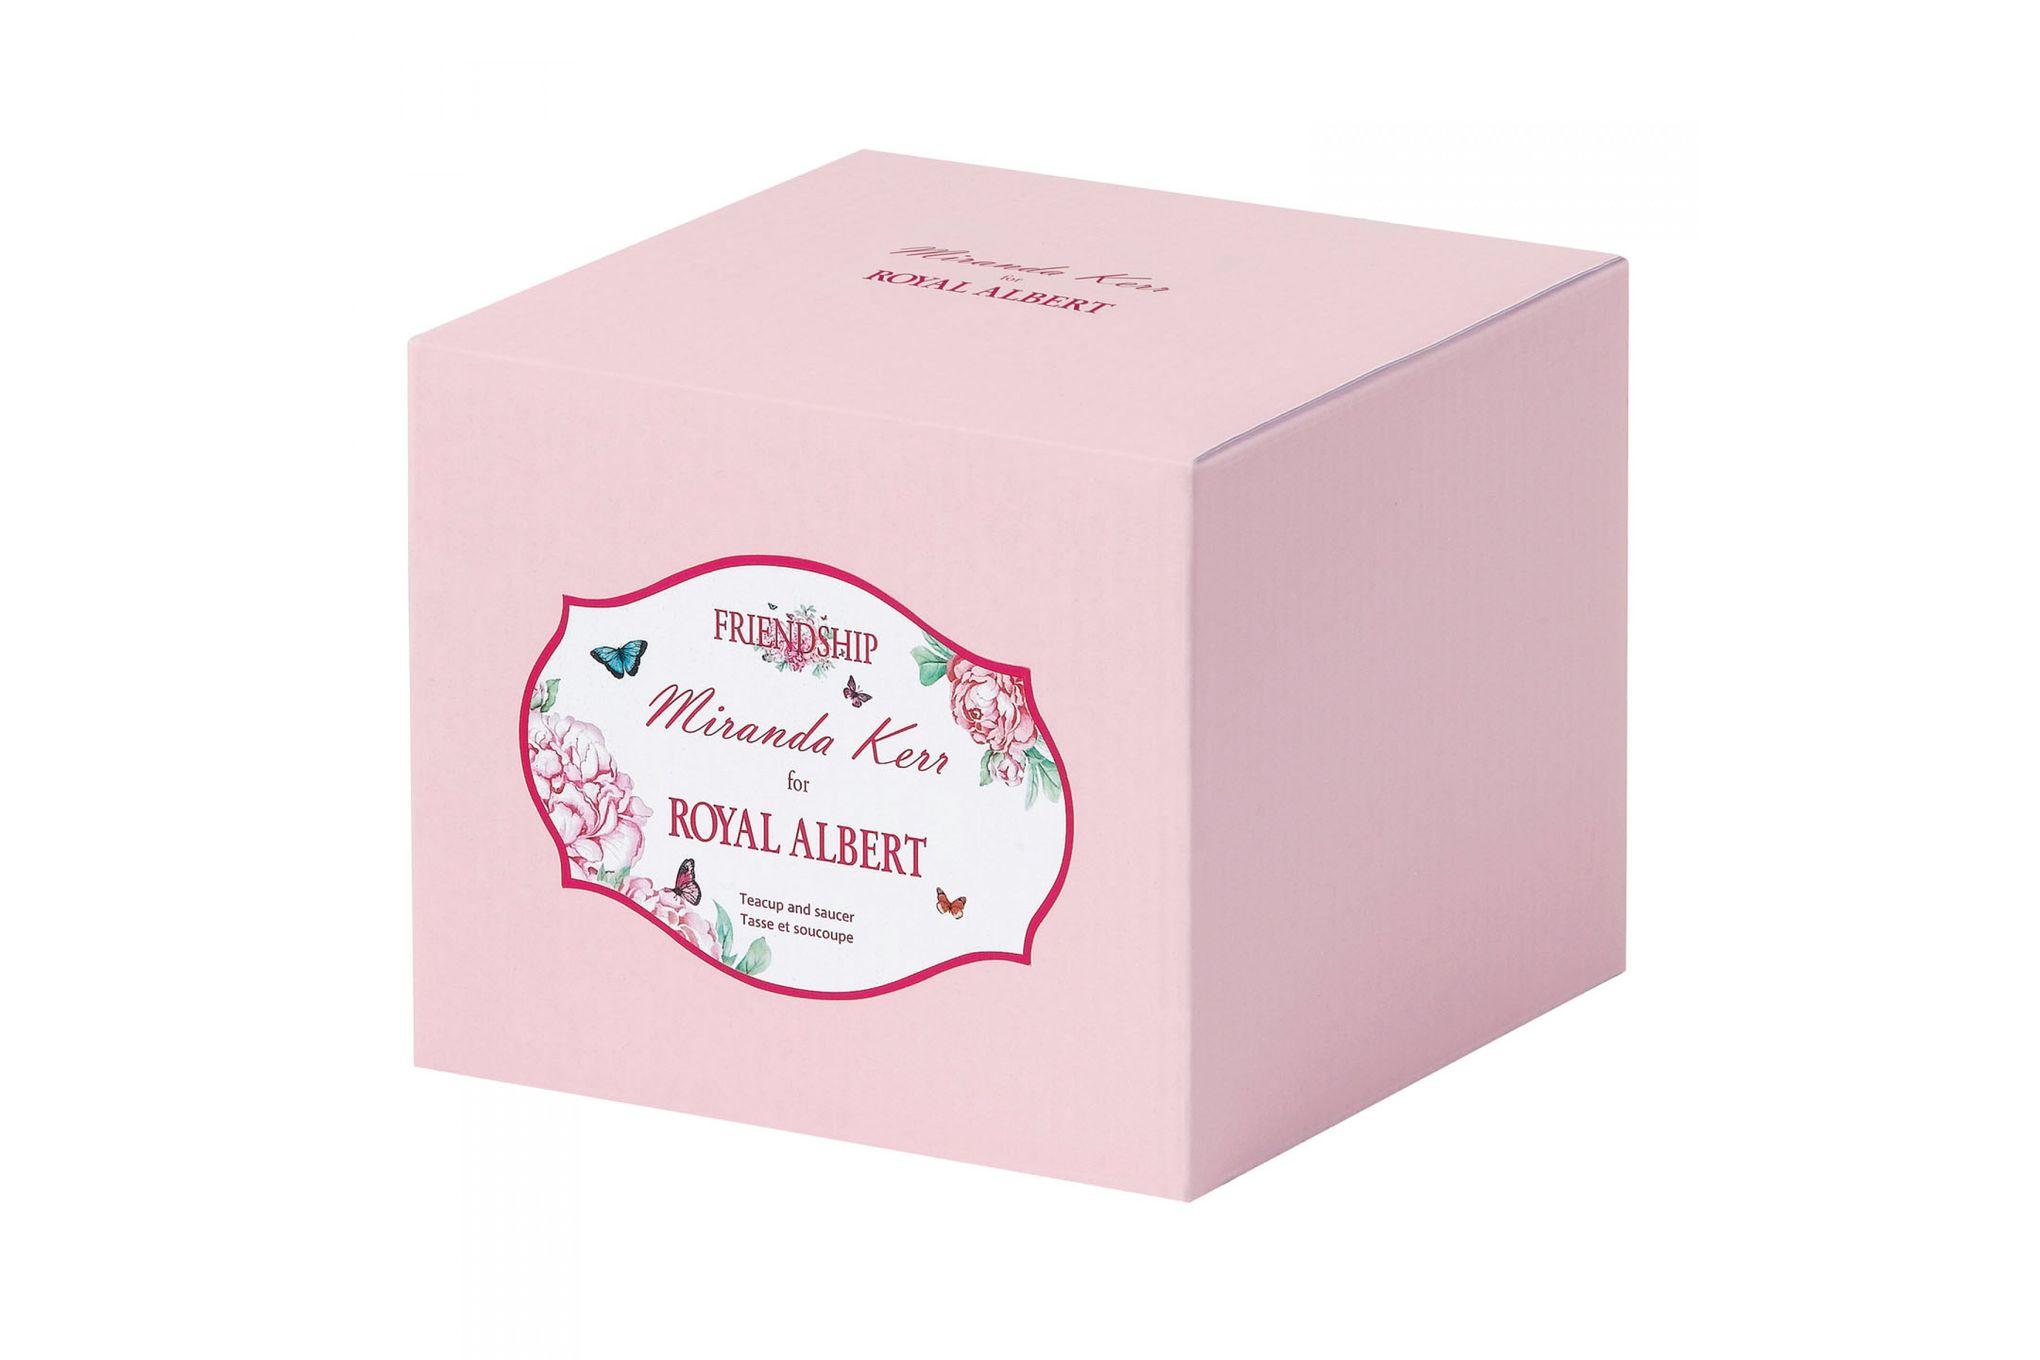 Miranda Kerr for Royal Albert Friendship Teacup & Saucer thumb 2